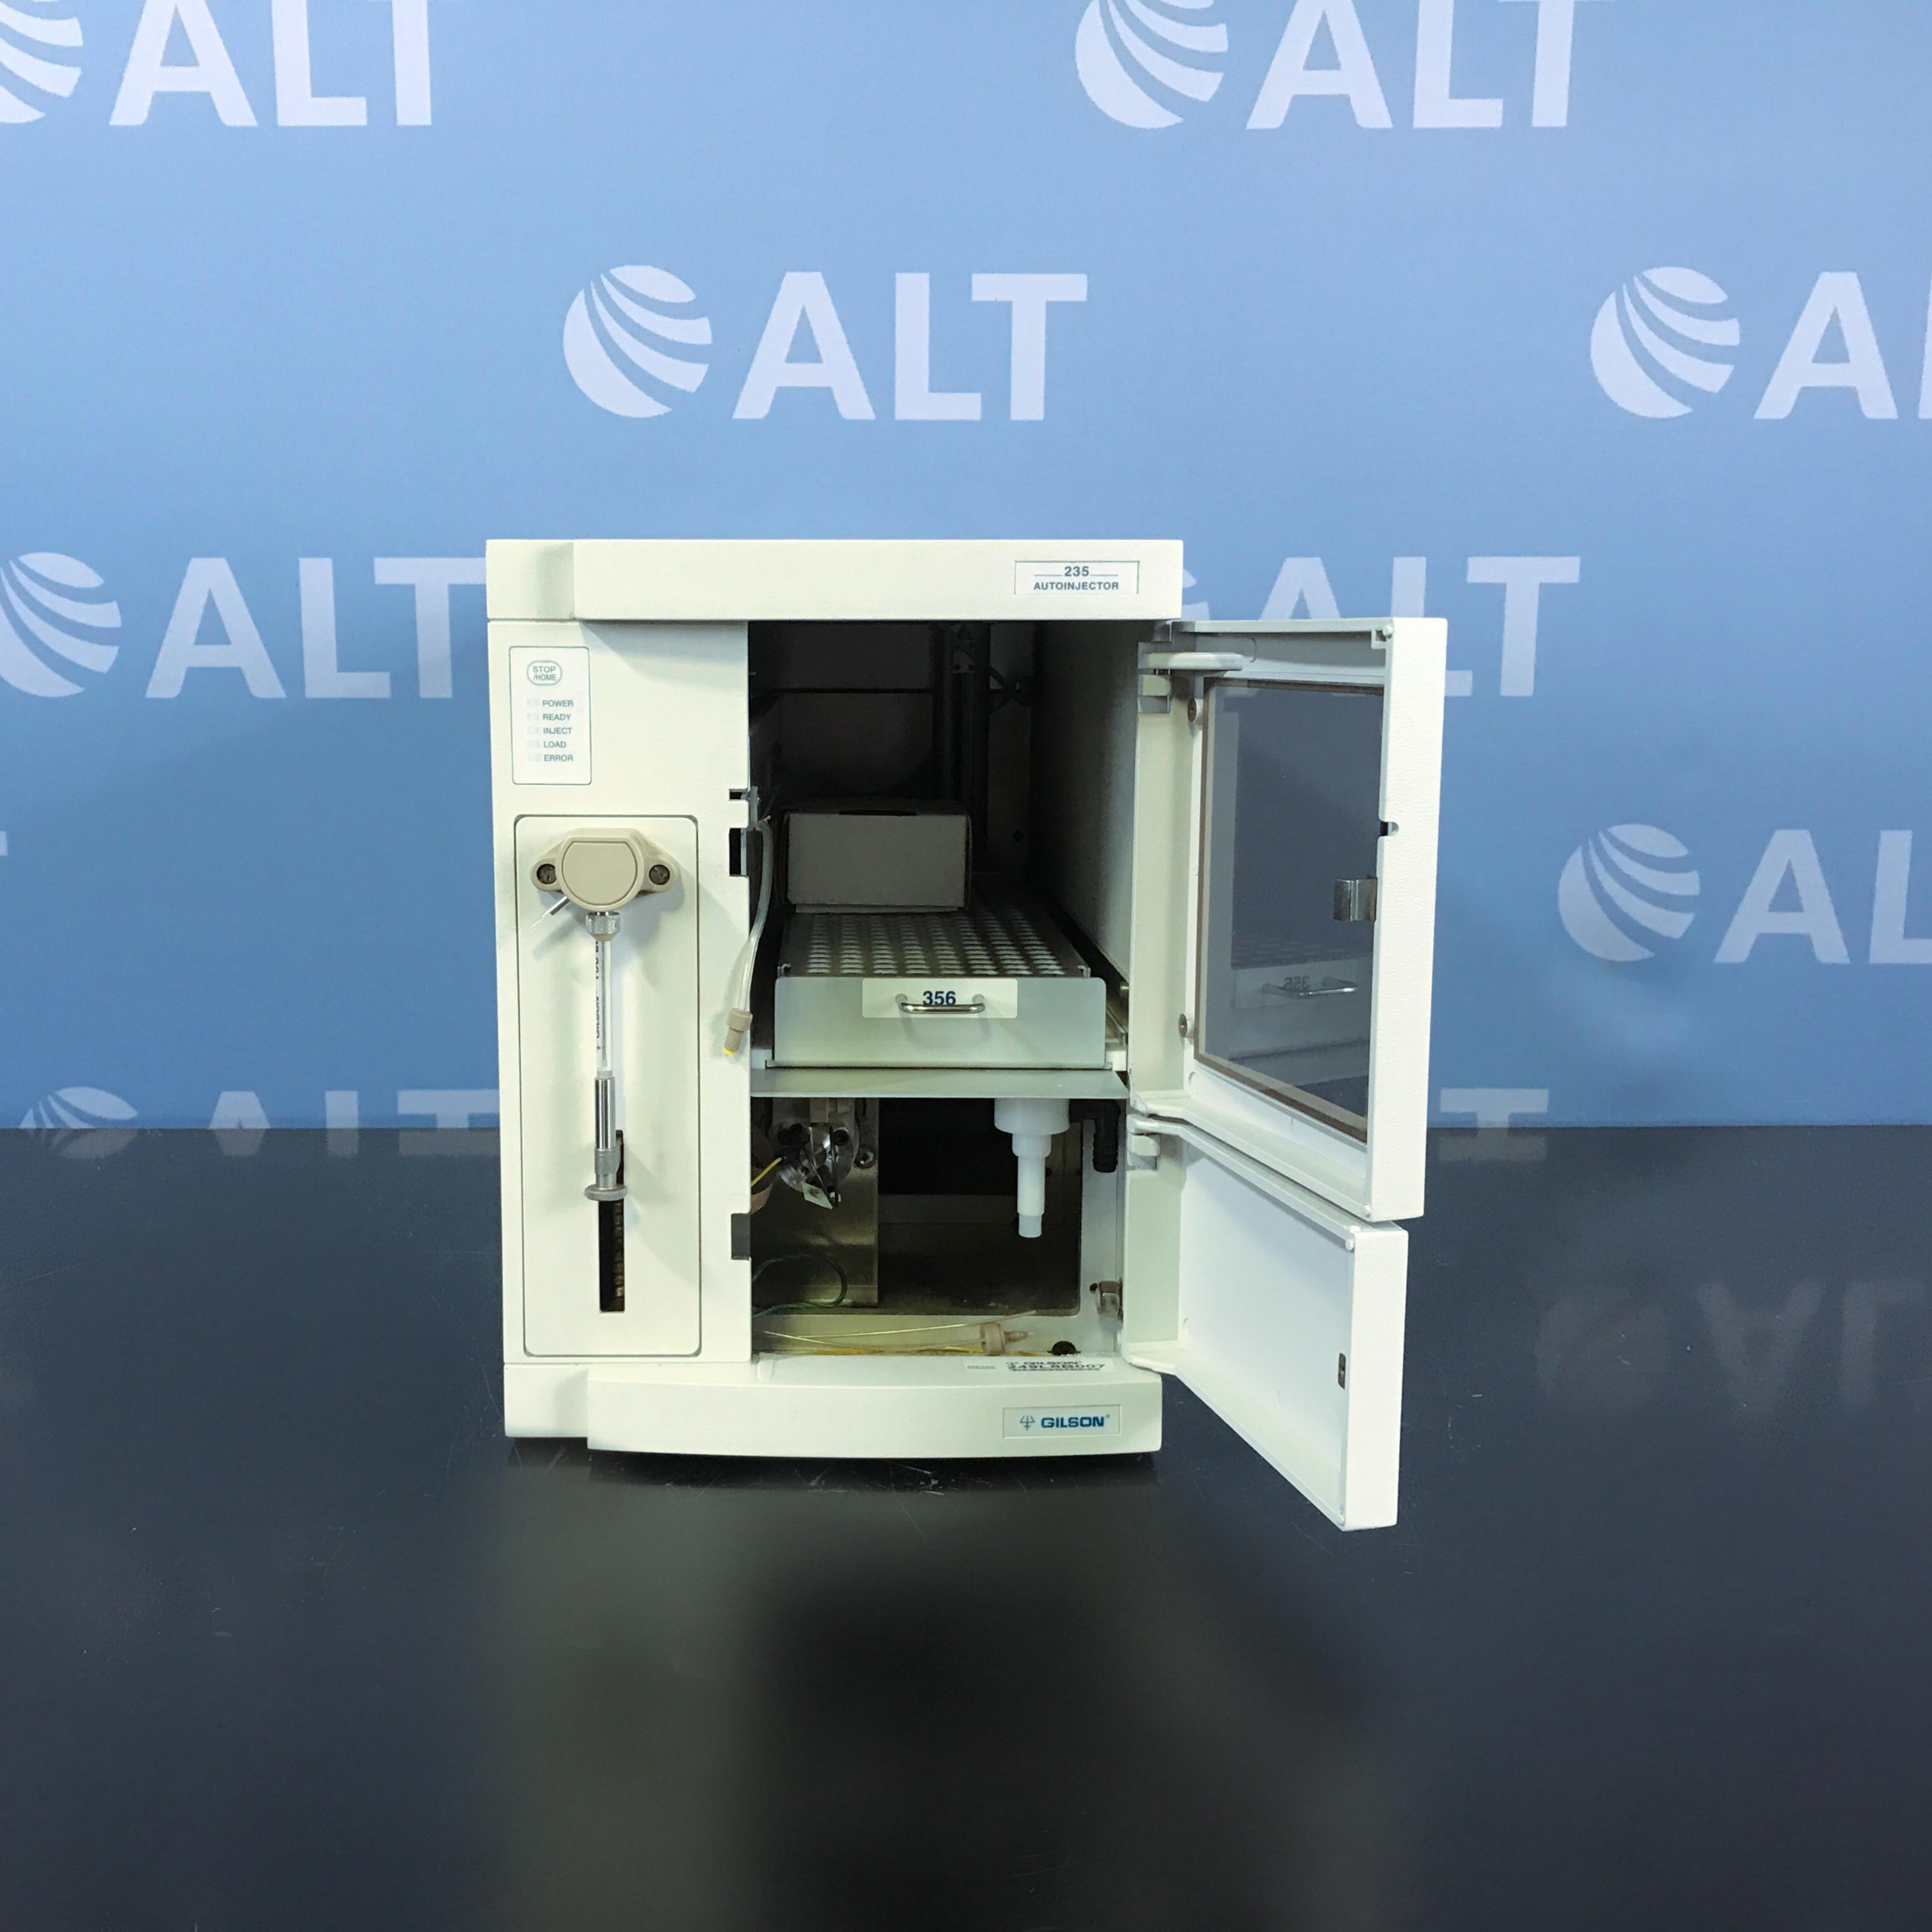 Gilson 235 Auto injector Image